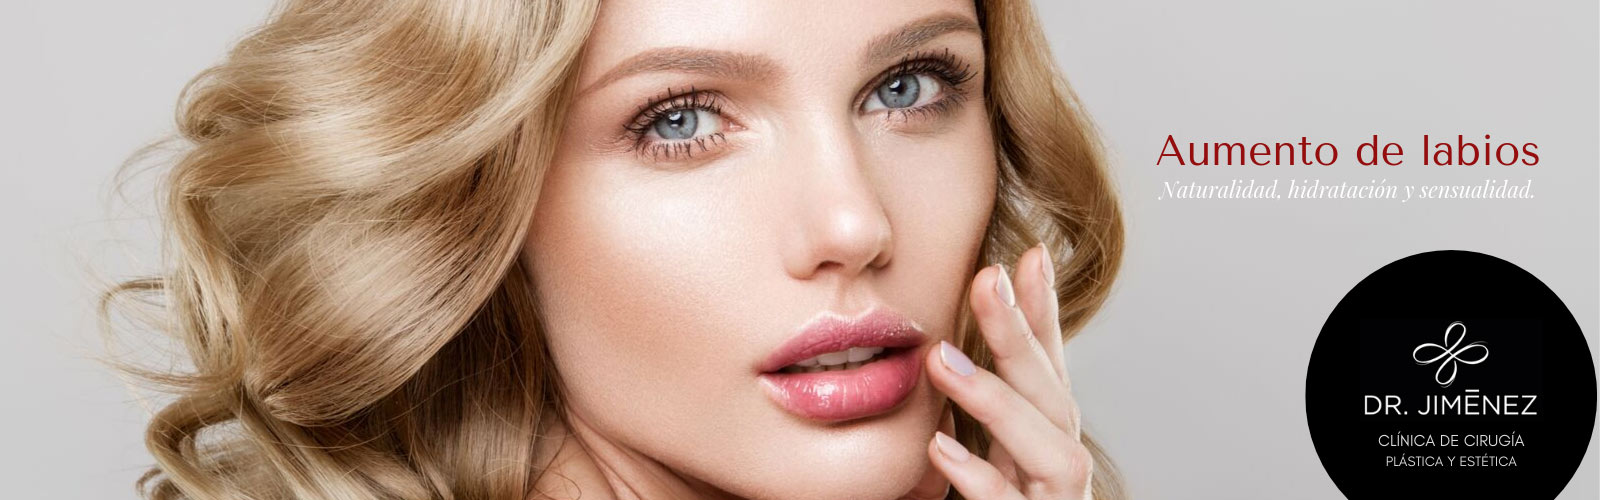 aumento-de-labios-murcia